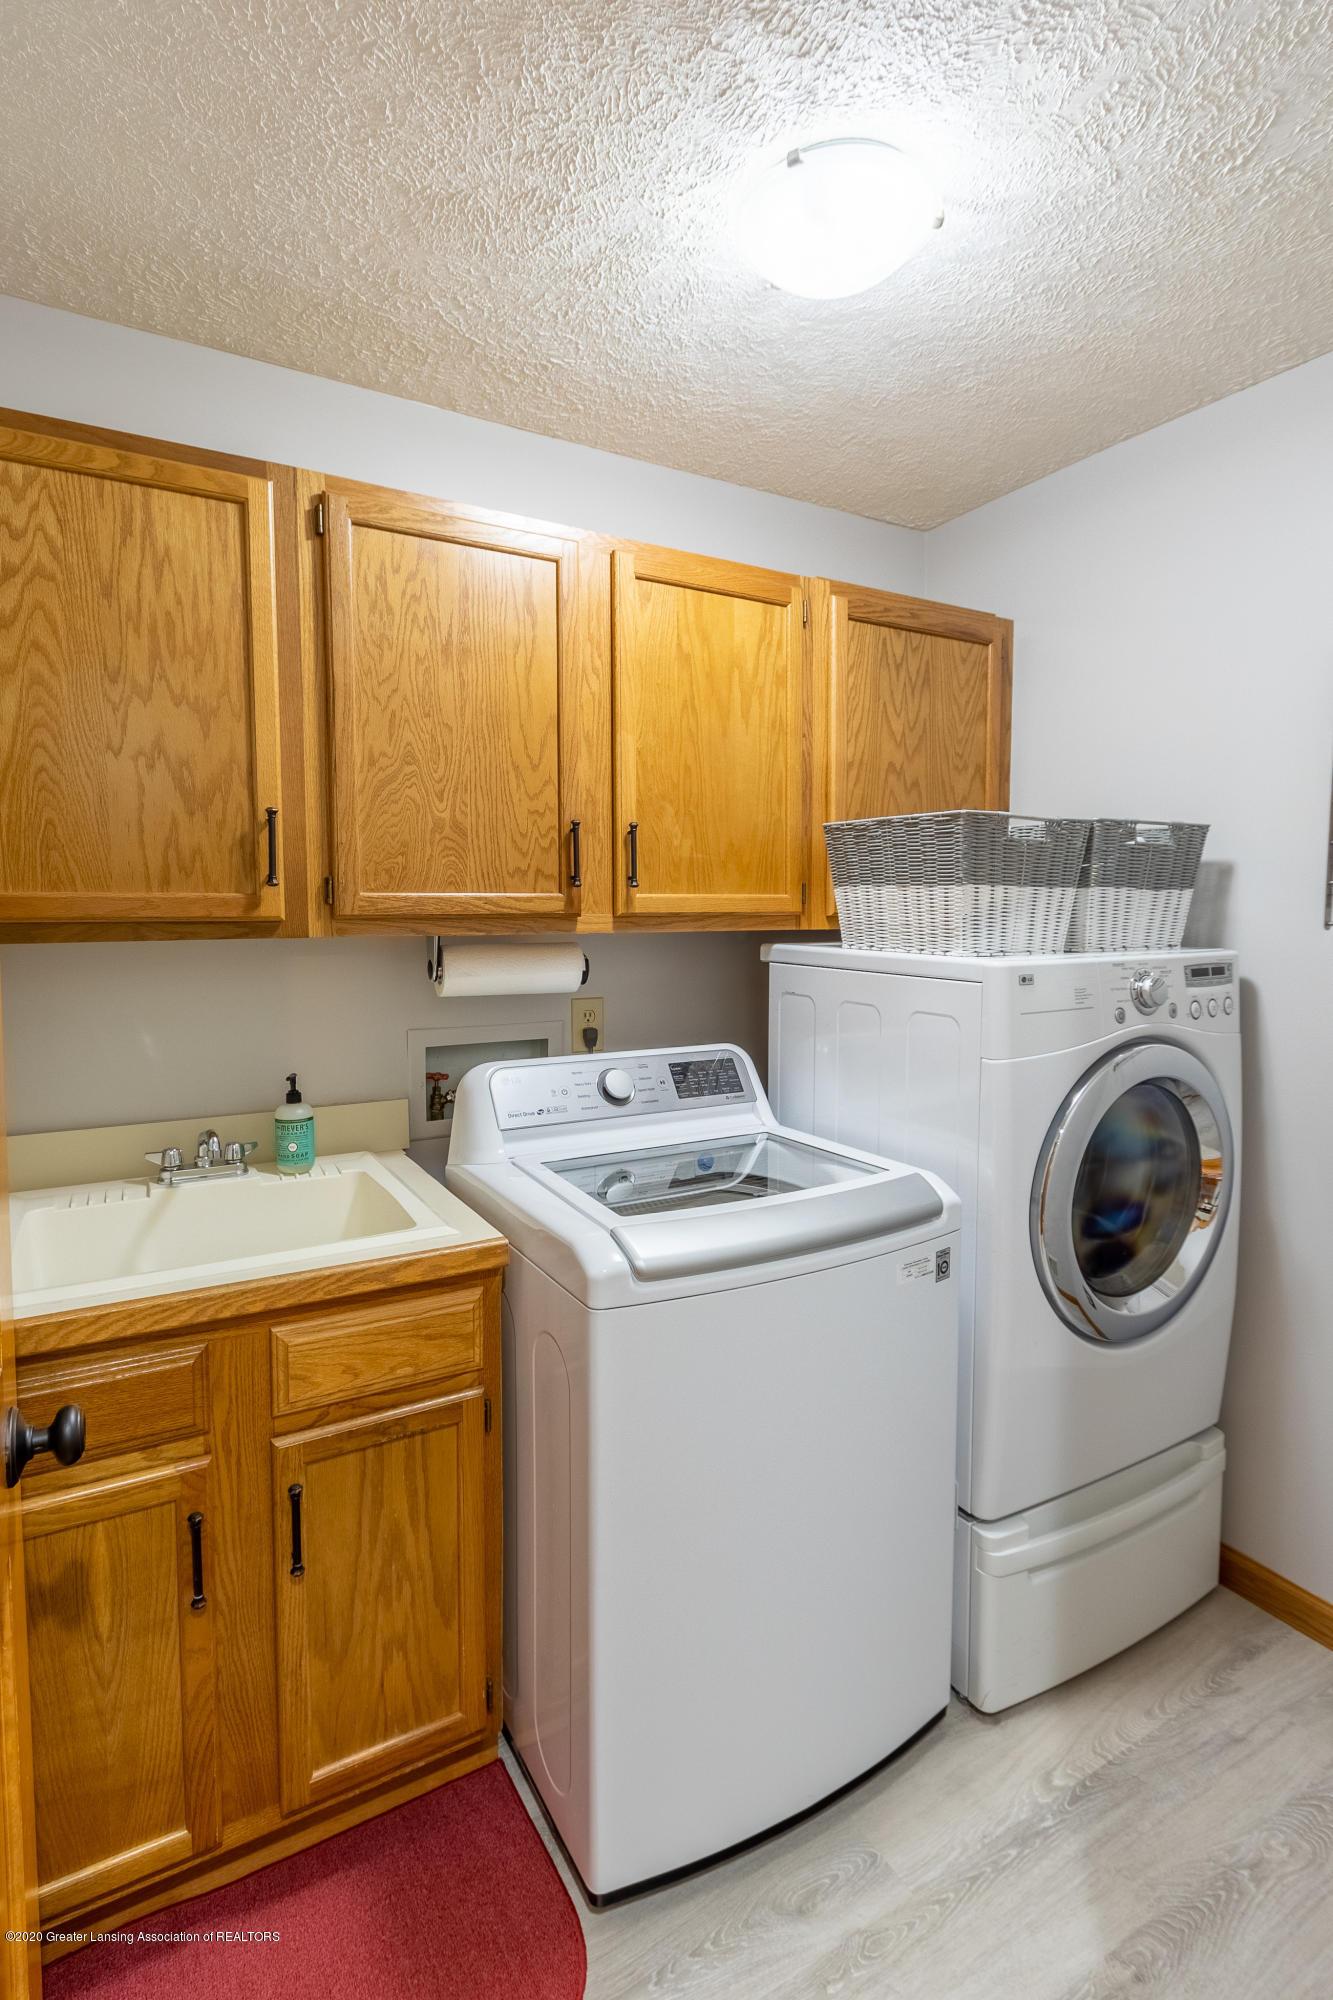 4221 Sandridge Dr - Laundry Room - 29